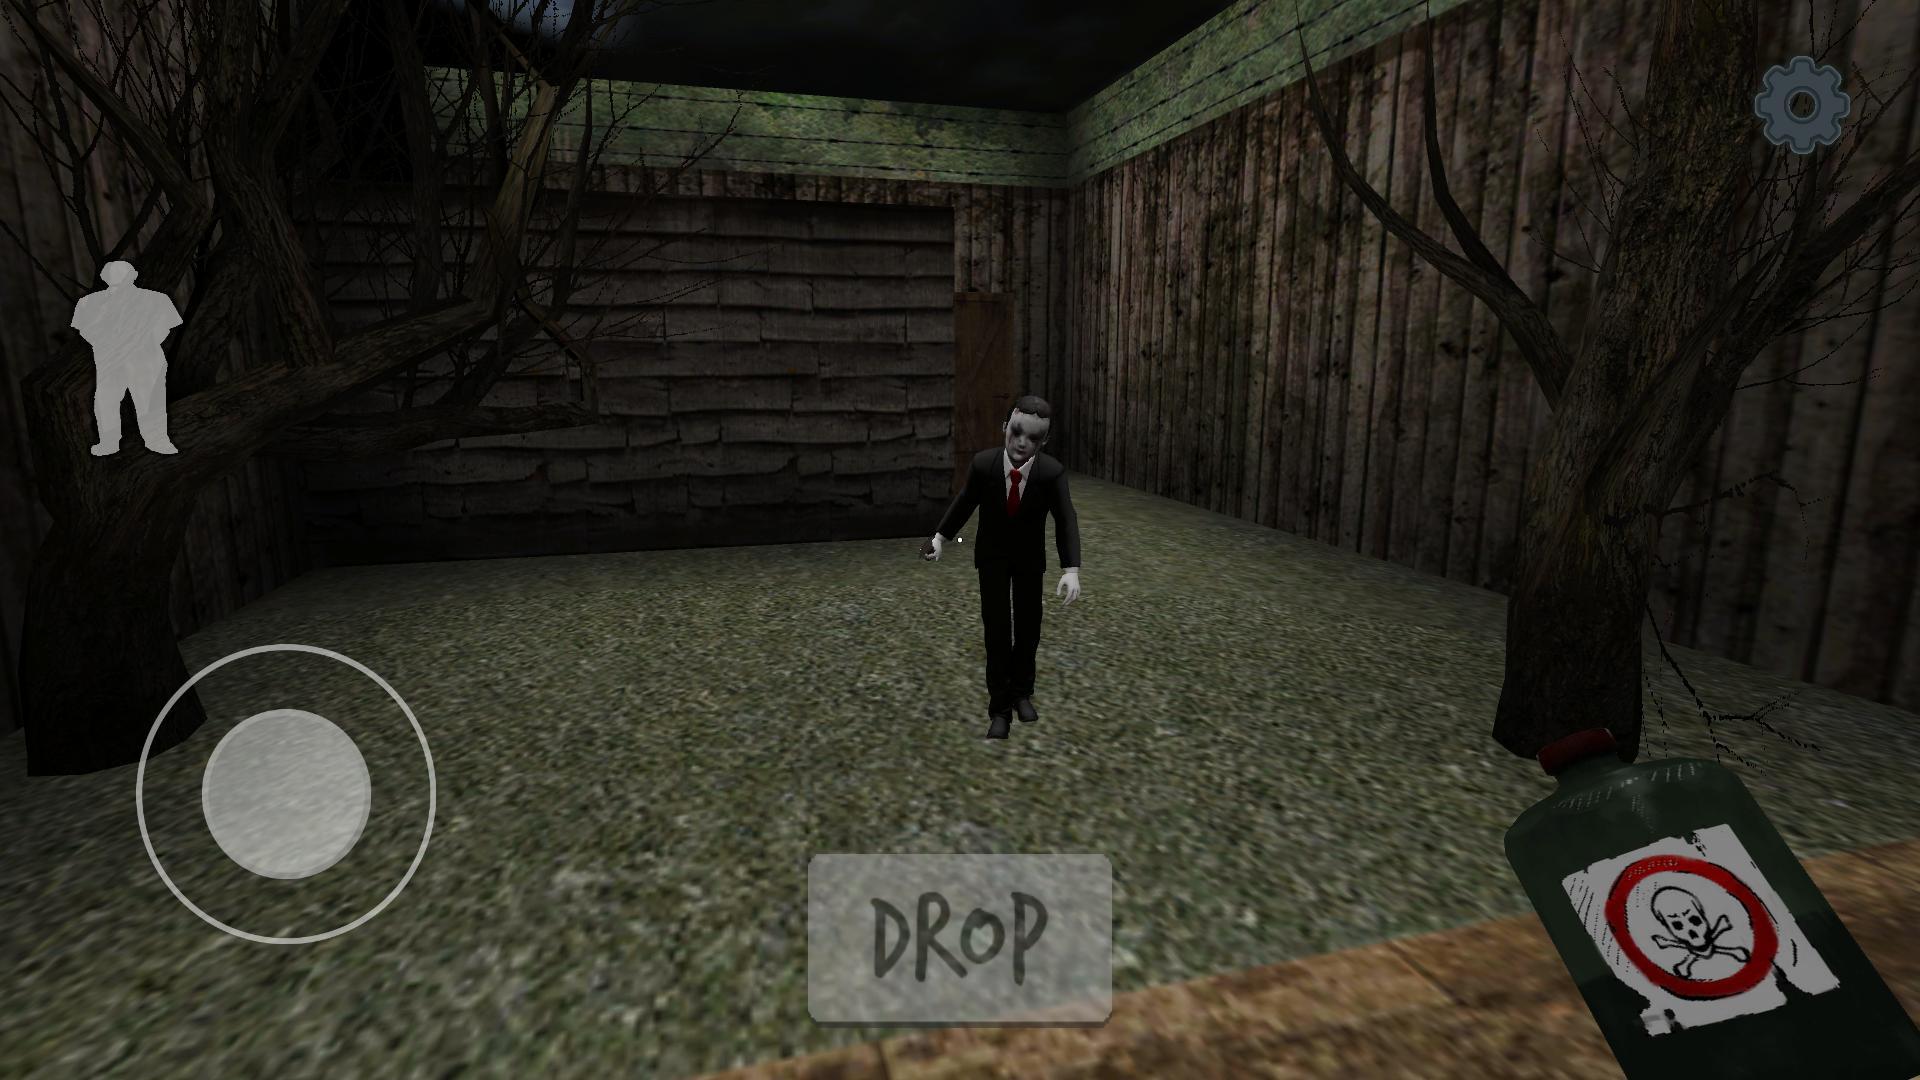 Evil Kid The Horror Game 1.1.9.5.4.4 Screenshot 4